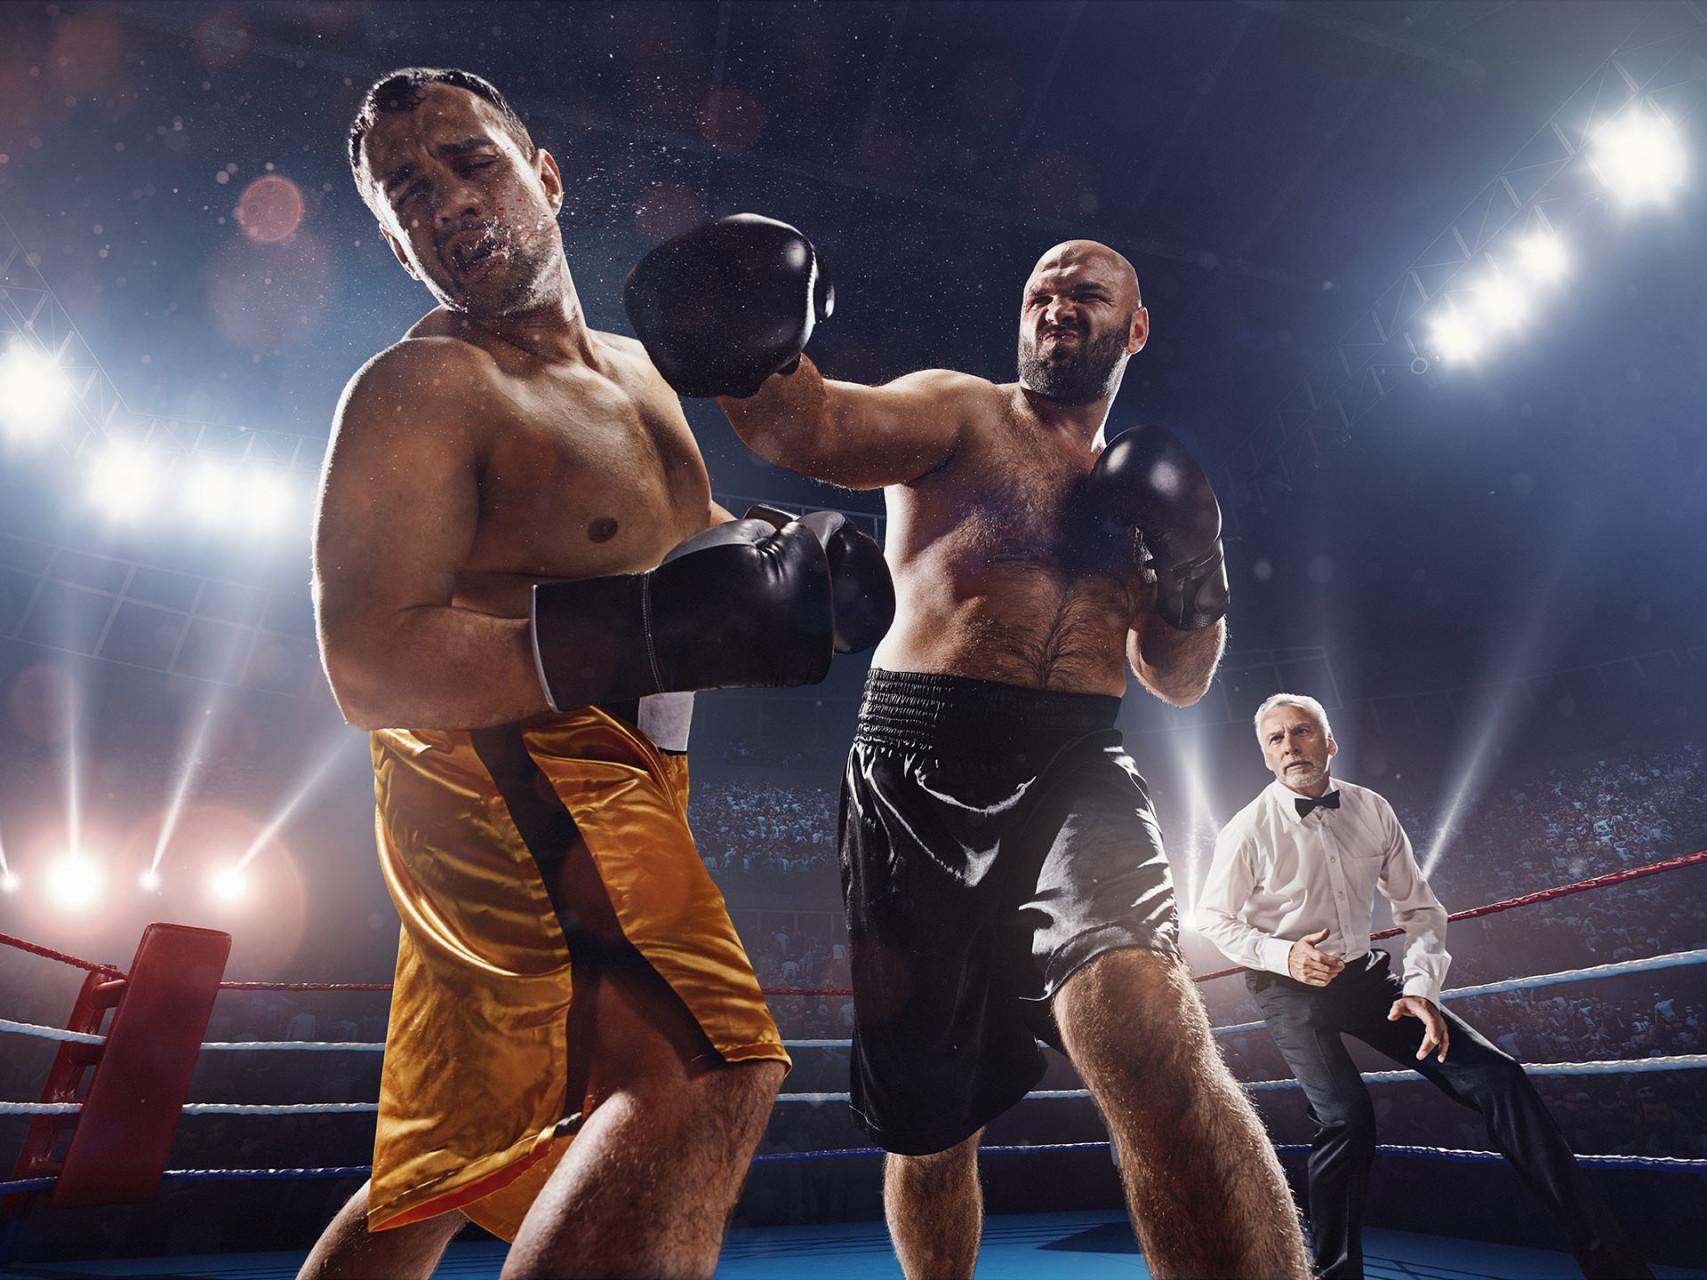 Boxing_2016_10_26_cam5_01-1707x1280